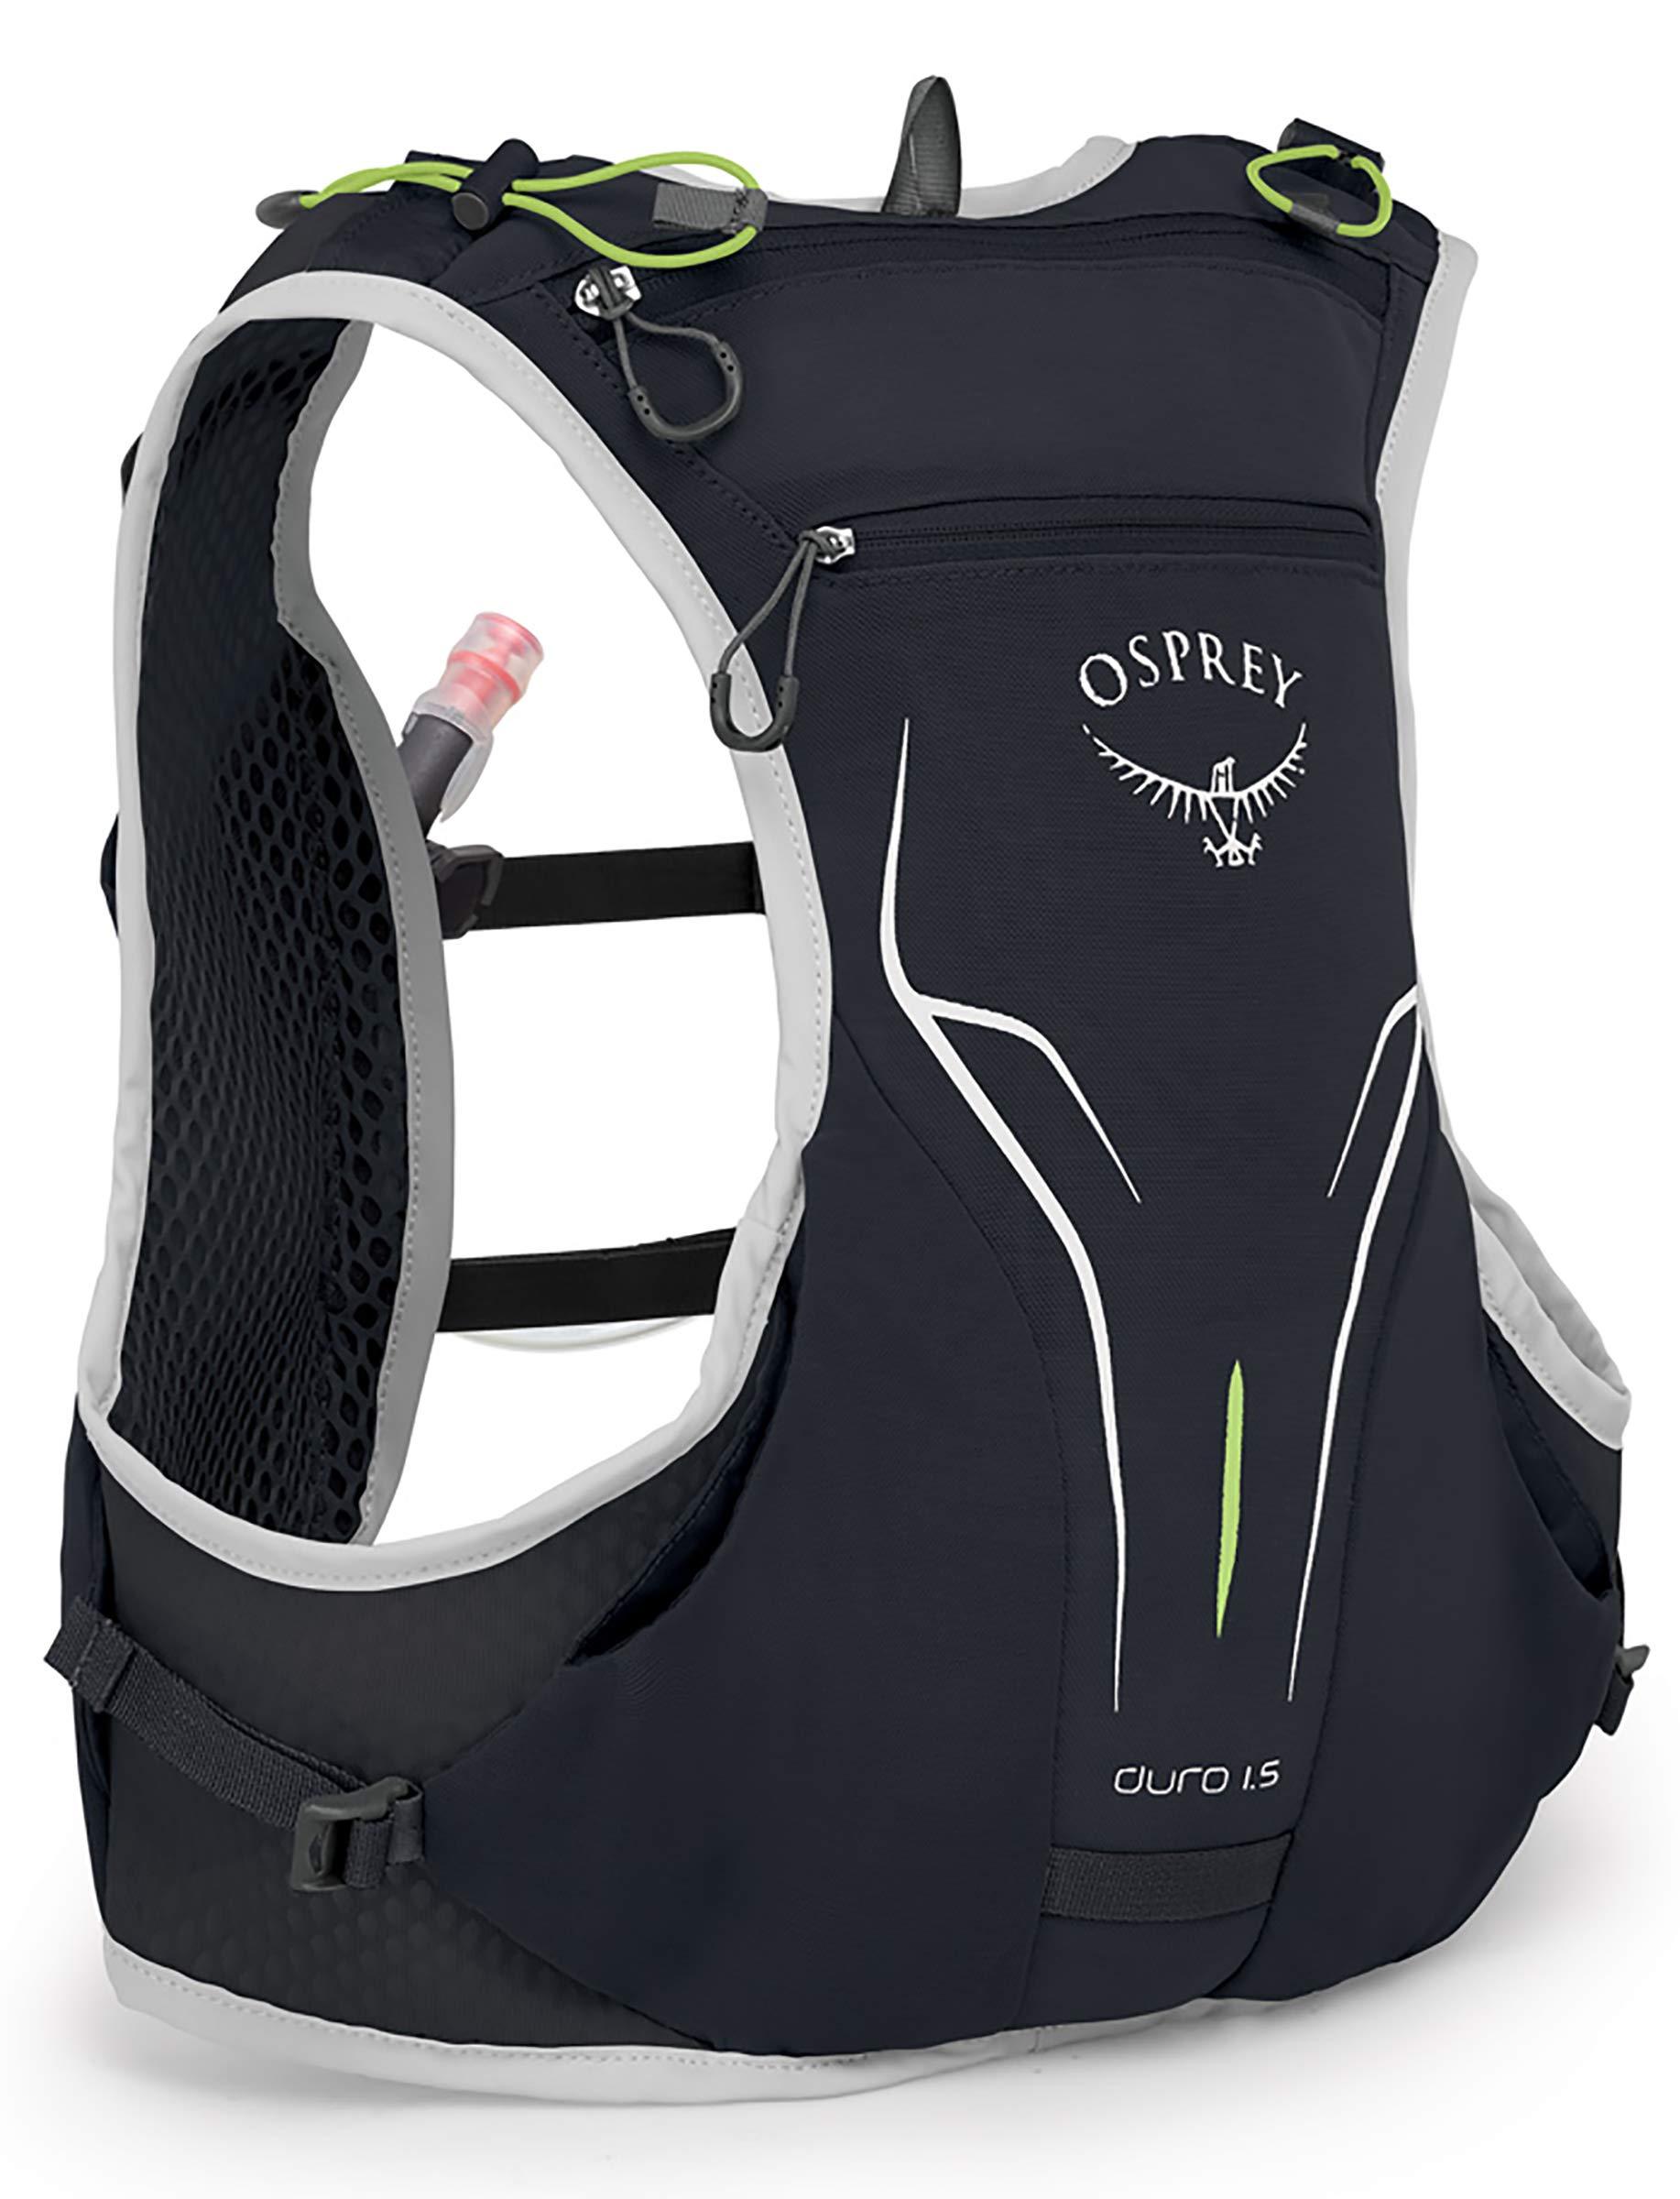 Osprey Packs Duro 1.5L Running Hydration Vest, Alpine Black, Medium/Large